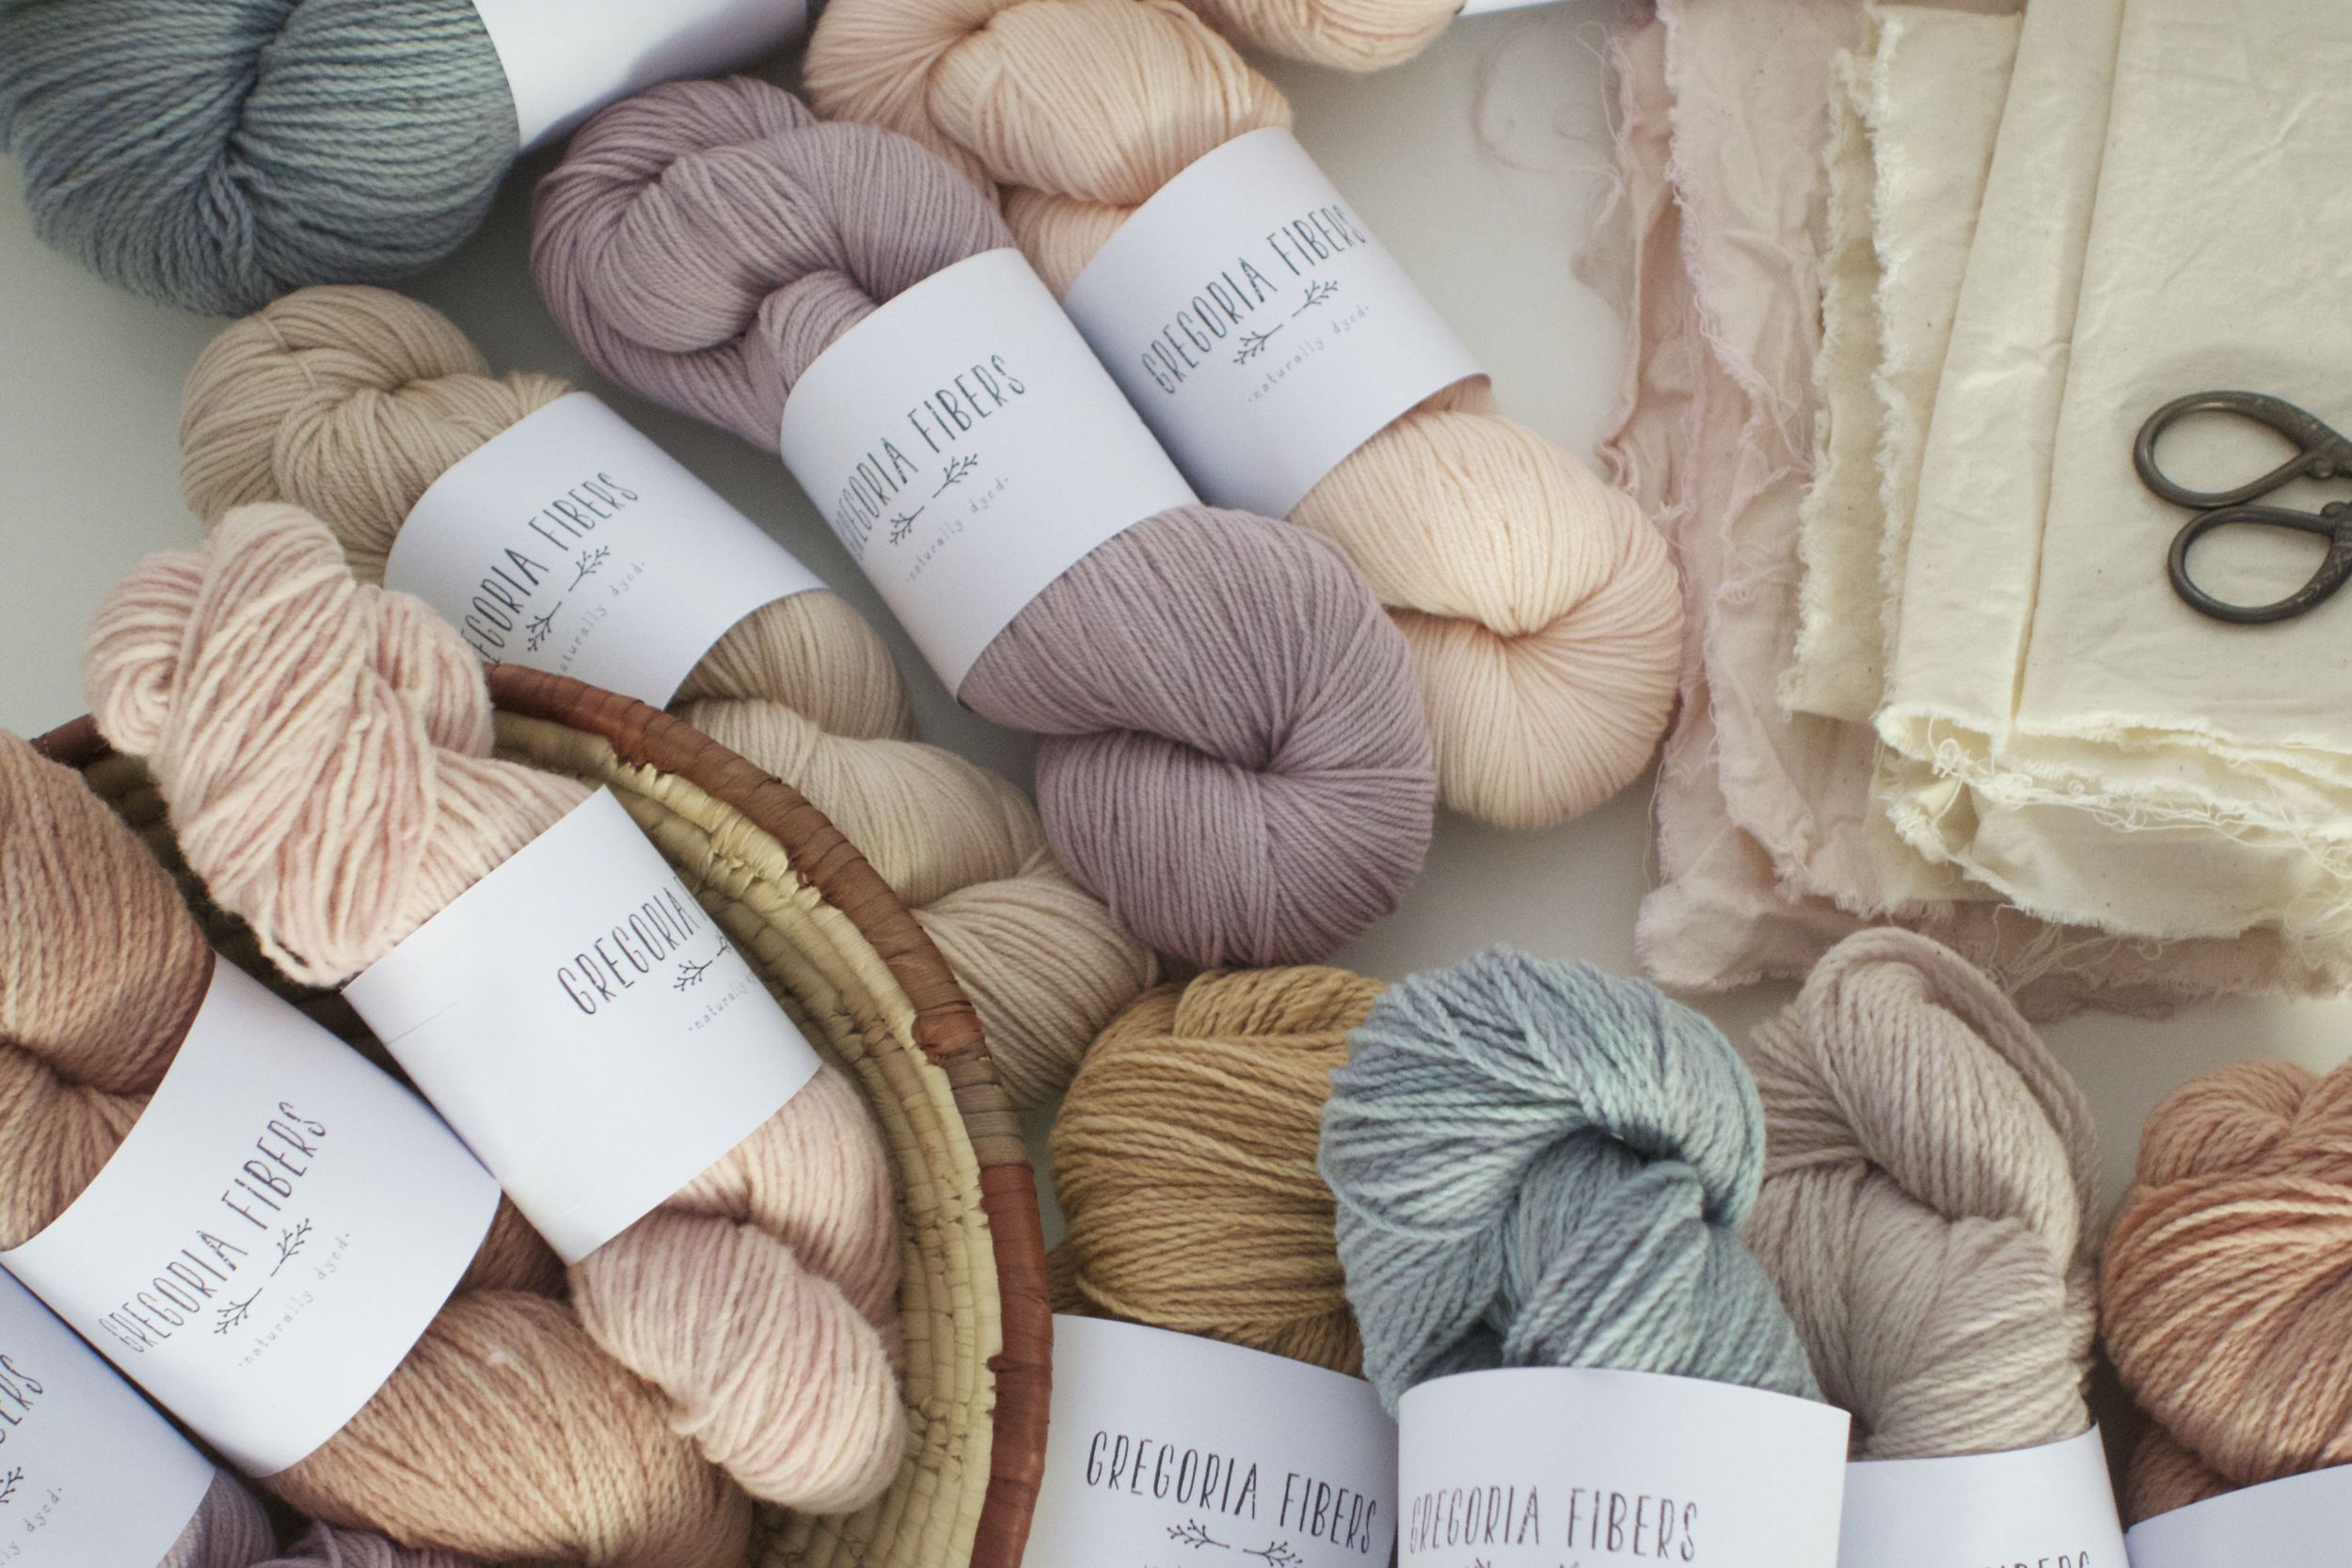 Gregoria Fibers Yarn